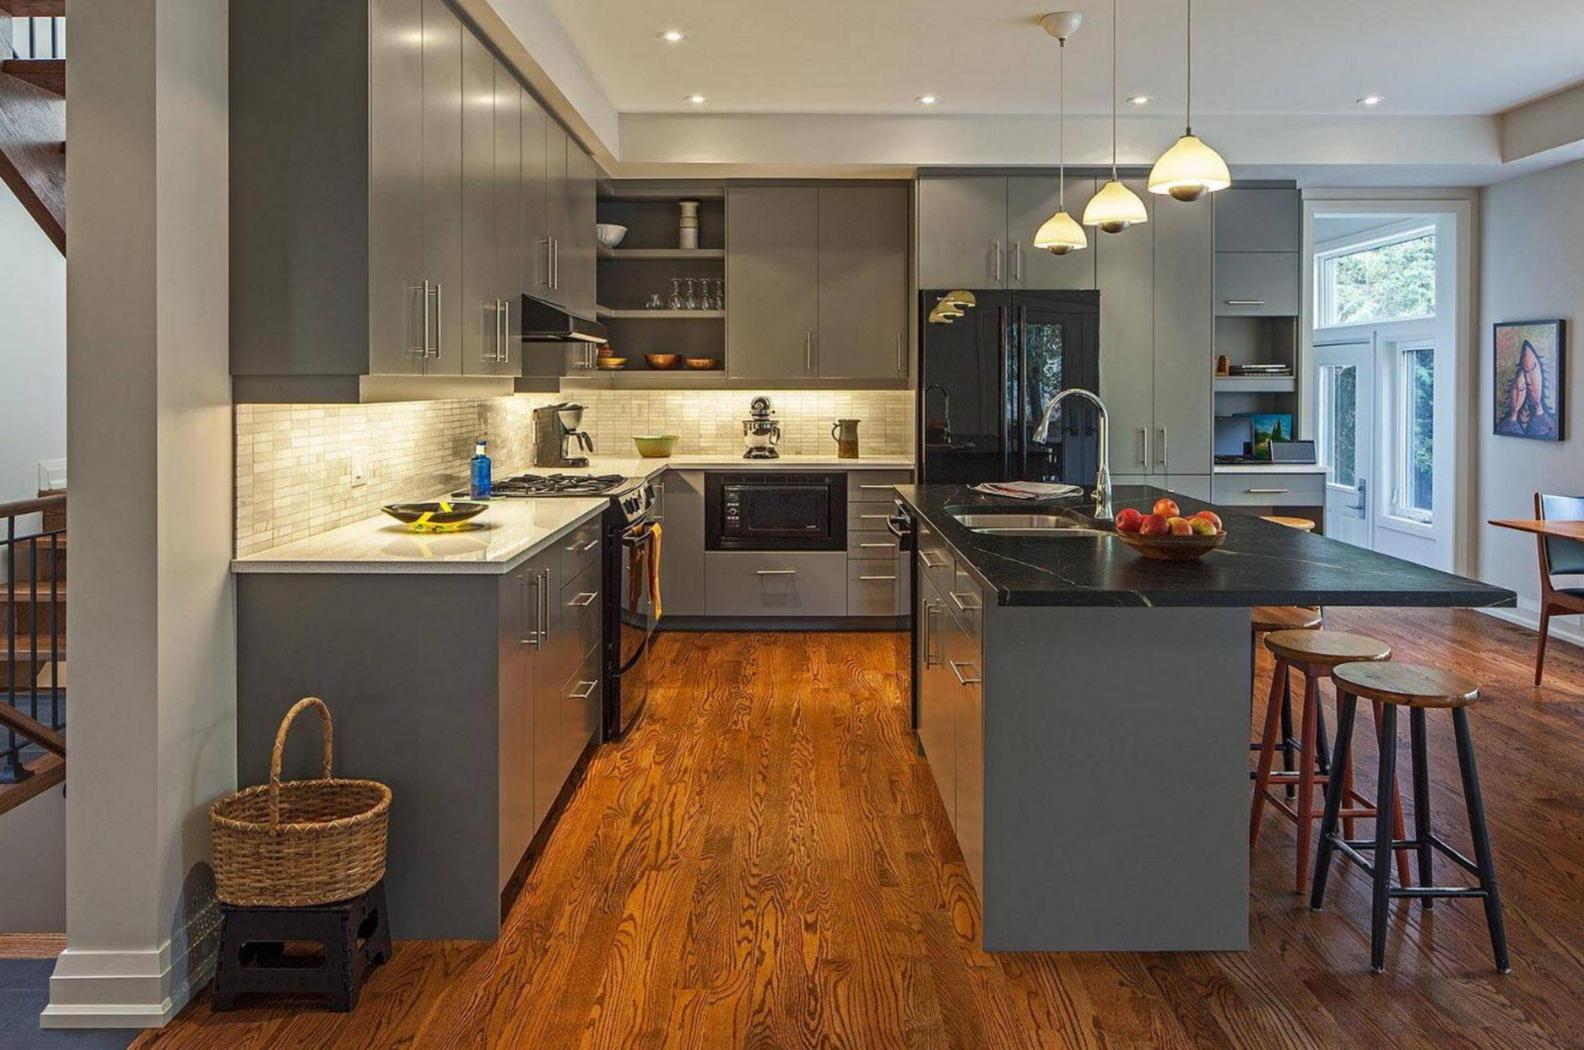 Kitchen Design Ideas With Black Appliances ~ Kitchens with black appliances in trending design